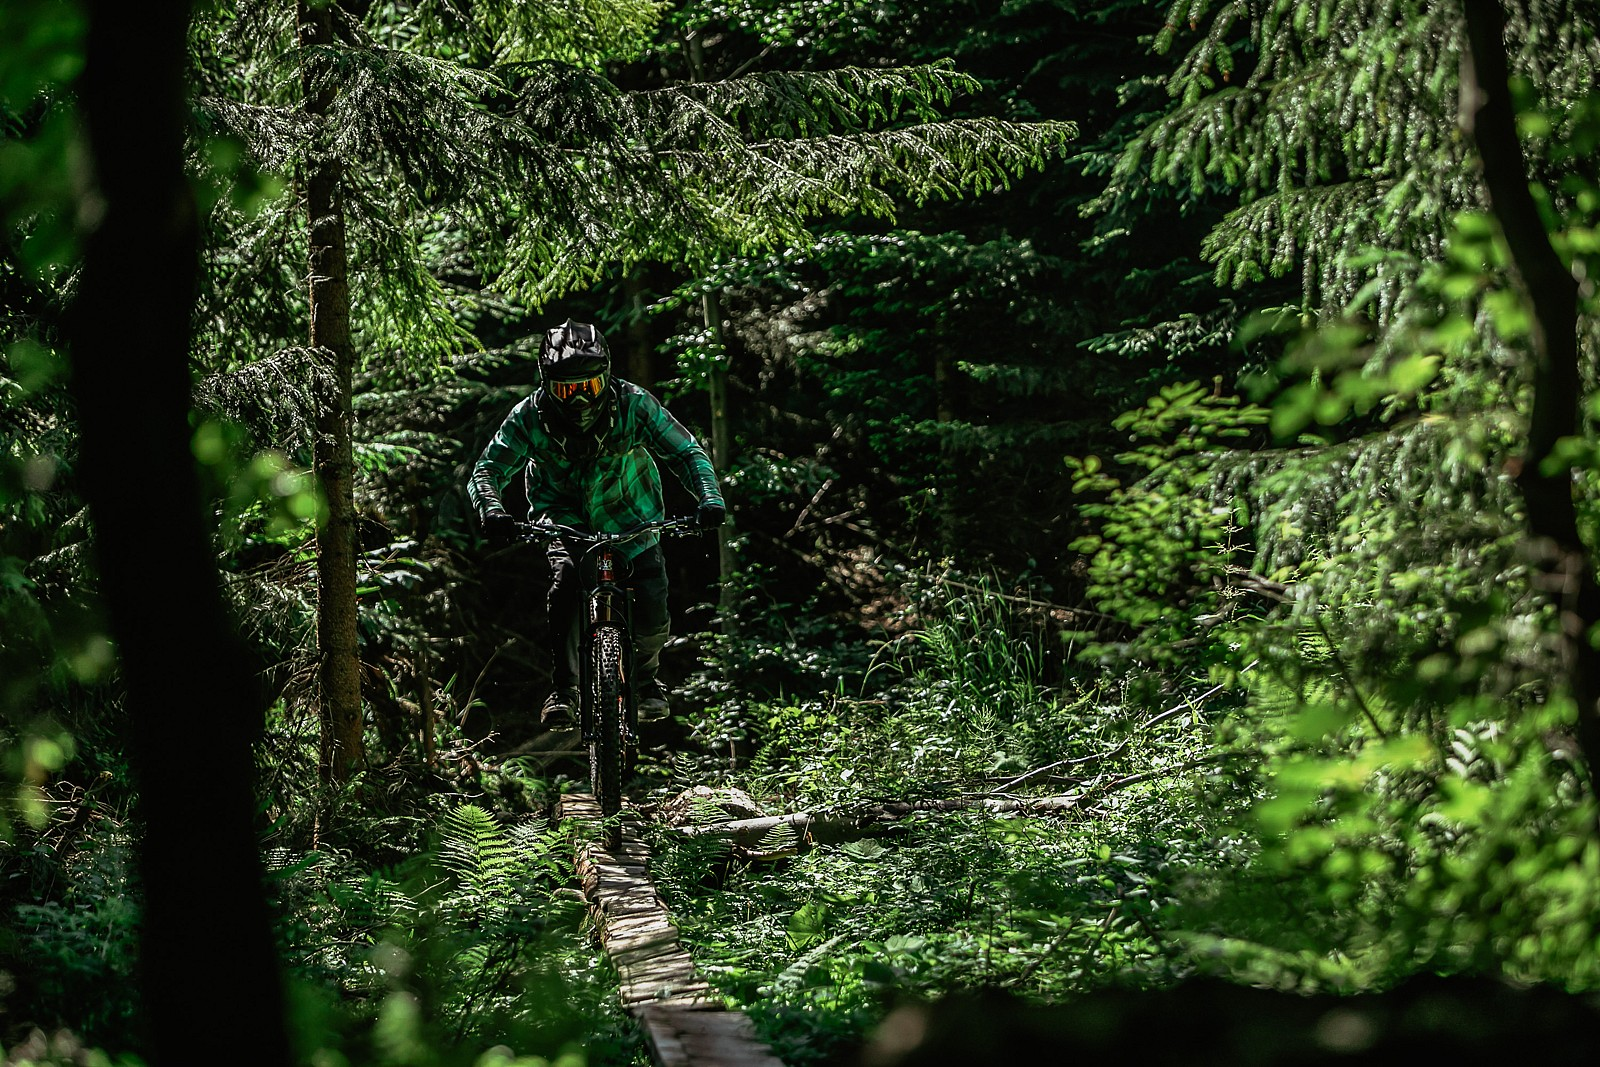 skinny - Banan - Mountain Biking Pictures - Vital MTB